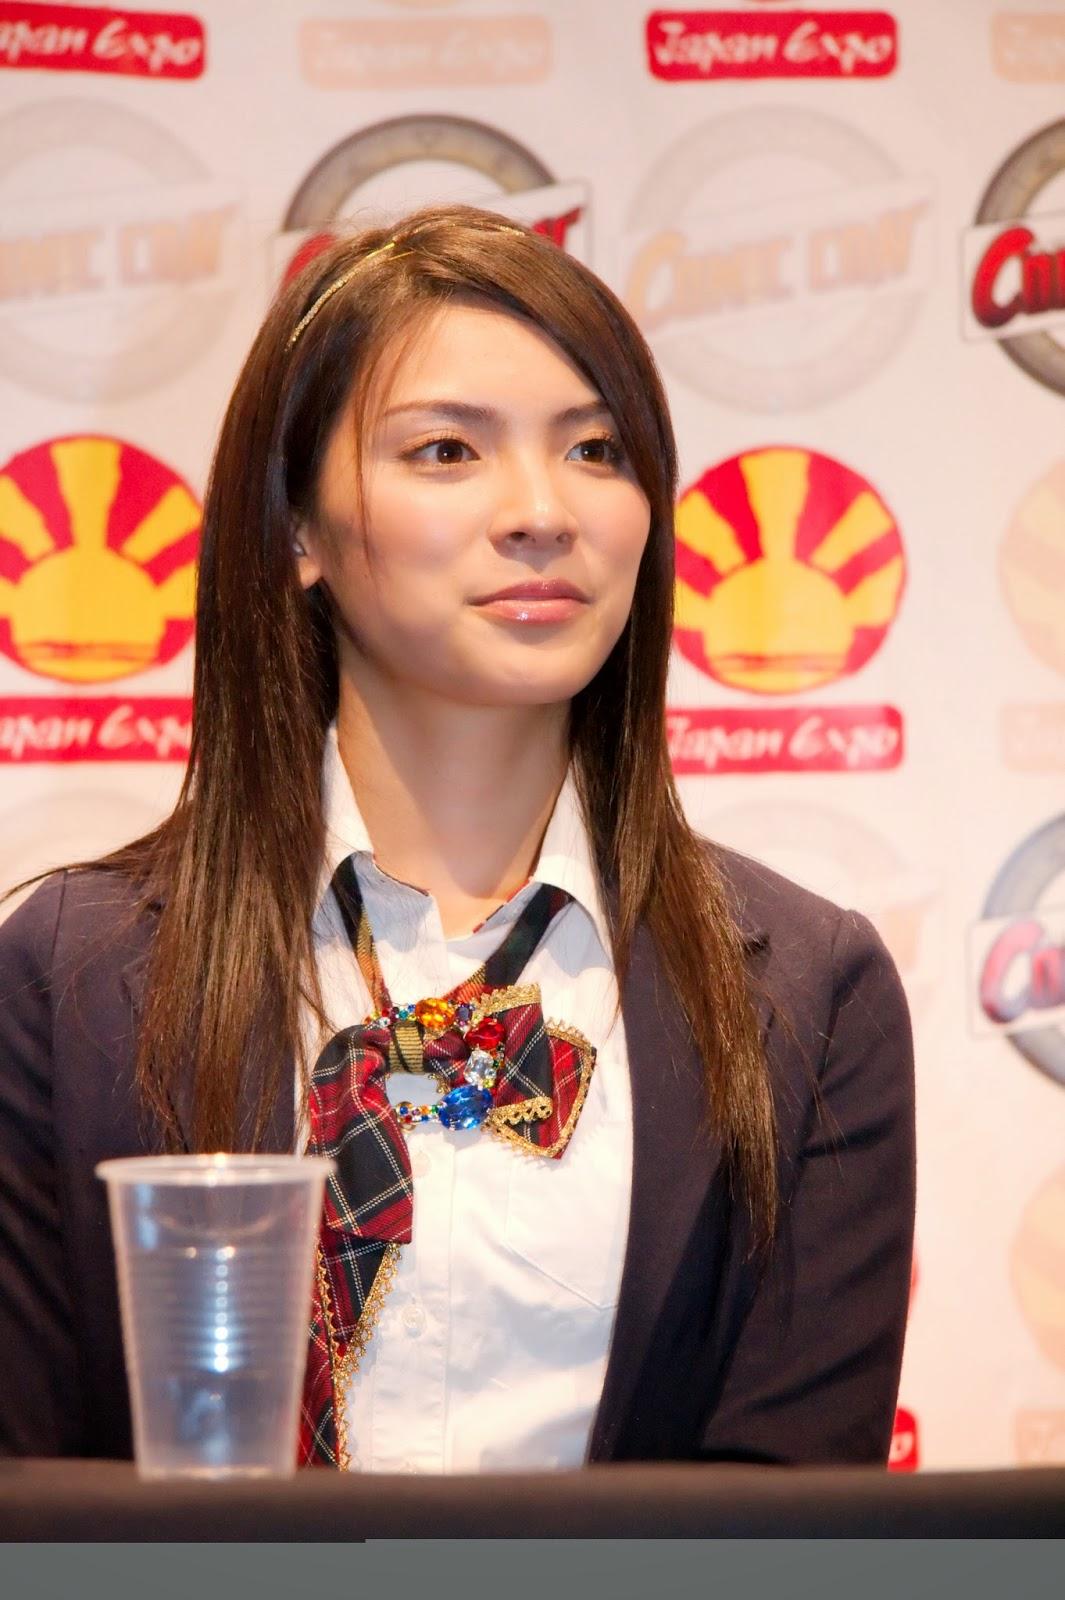 Akimoto Sayaka Gorilla Kecil Sayaka Akimoto yang